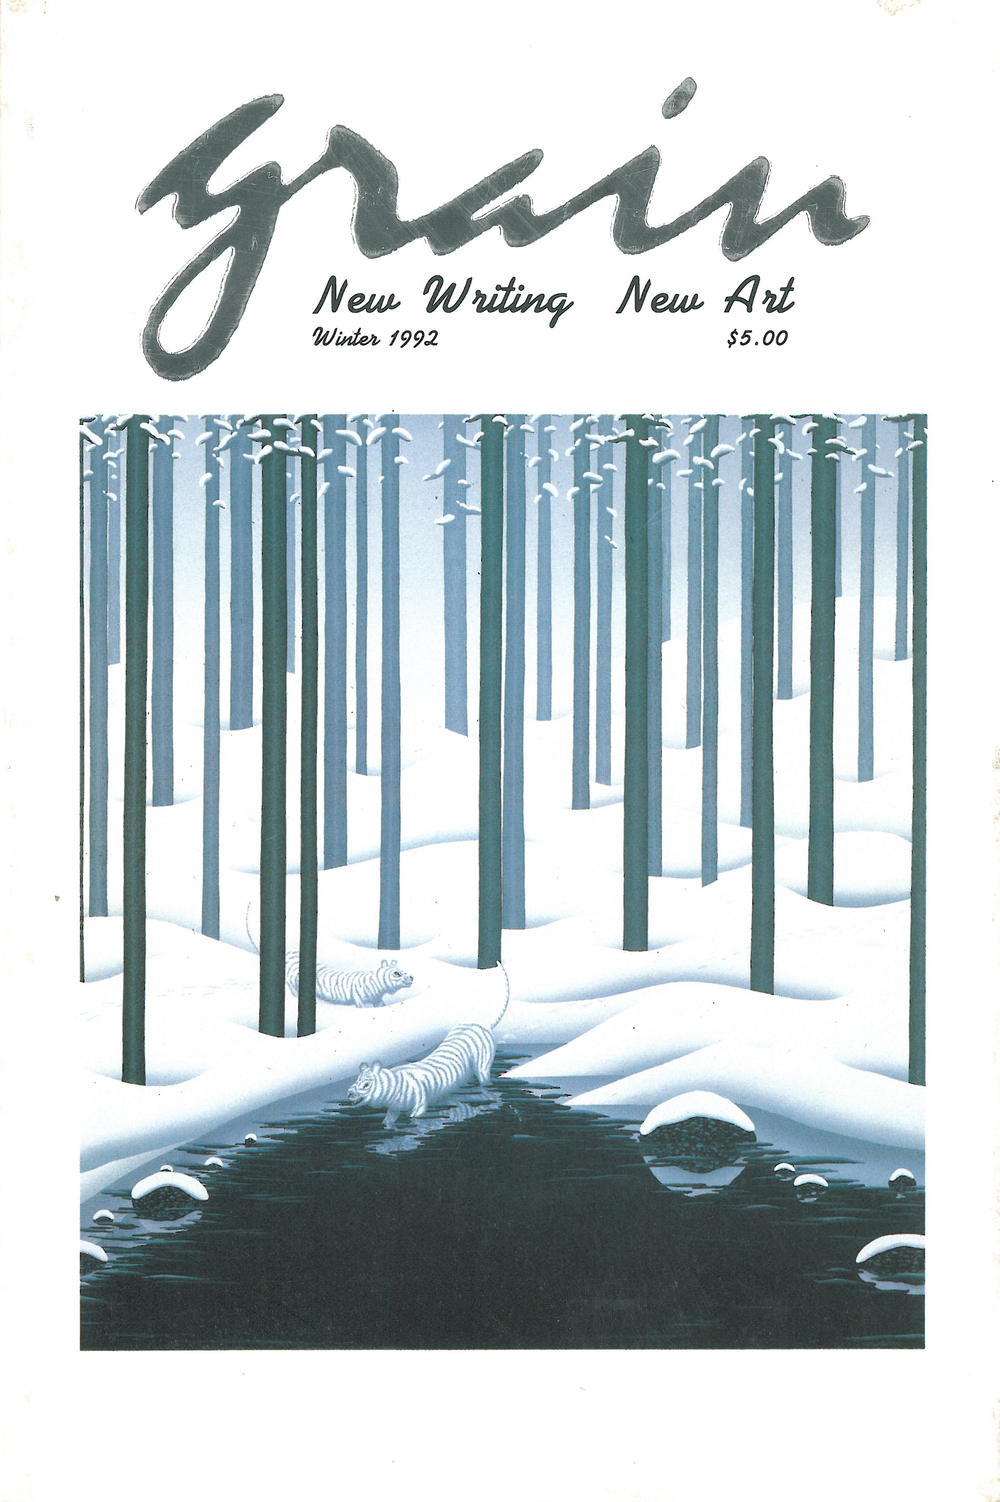 20.4 Winter 1992, Contest Winners